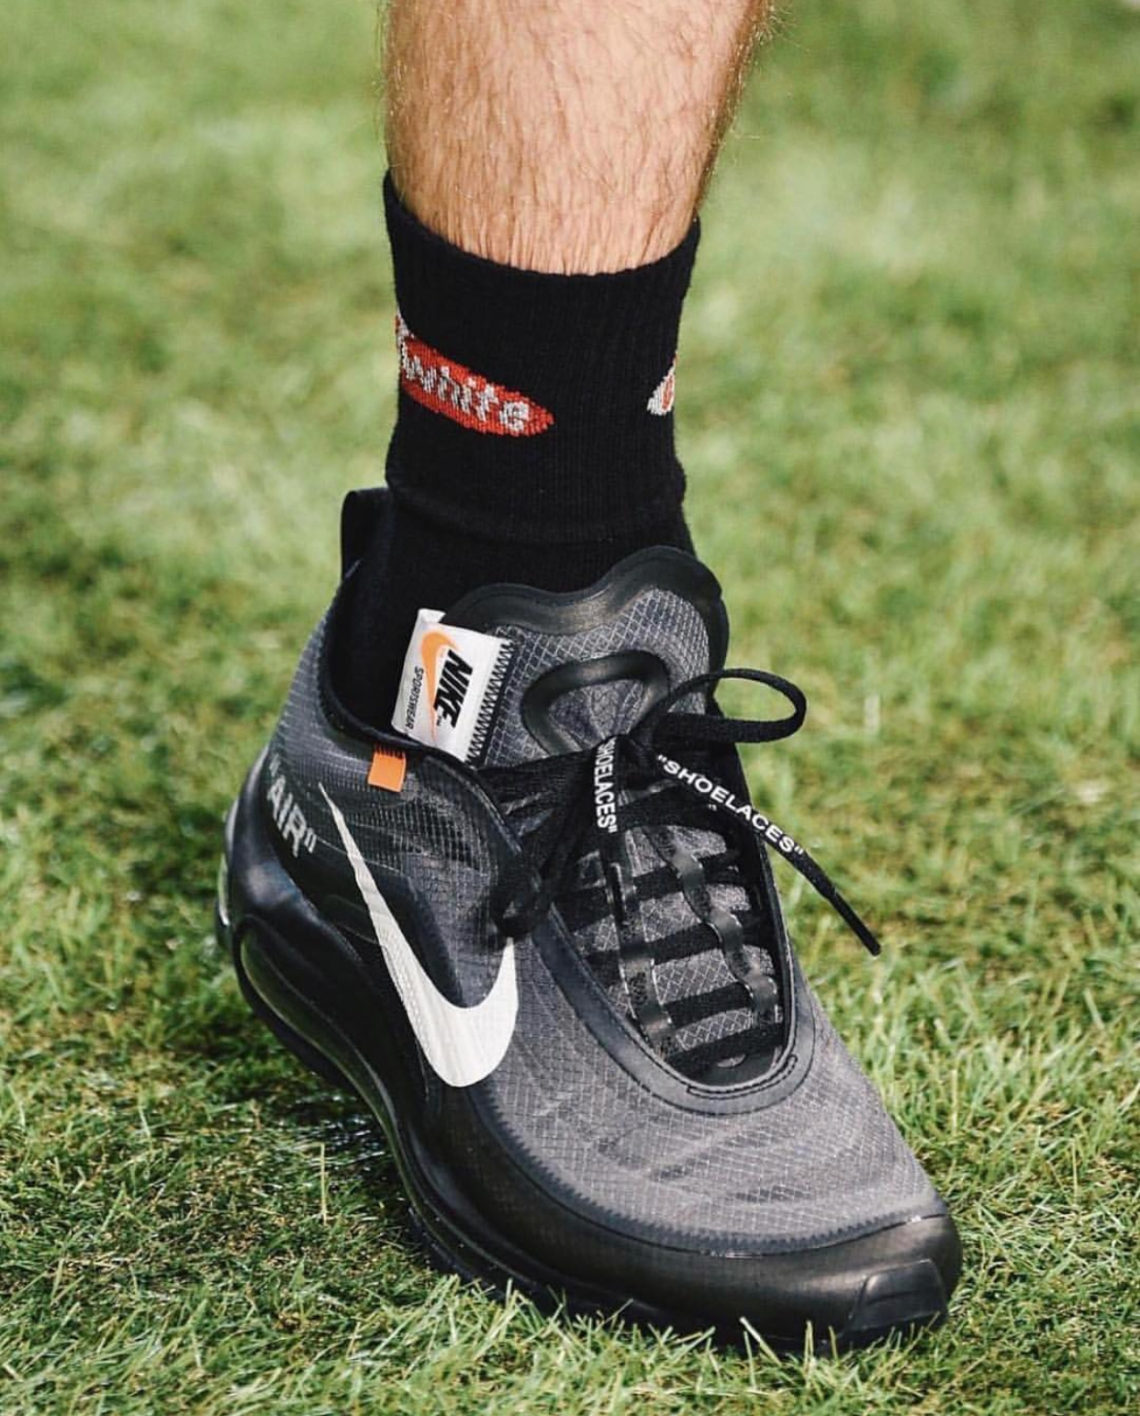 e49b26229f Off-White Nike Air Max 97 Grey + Black | SneakerNews.com